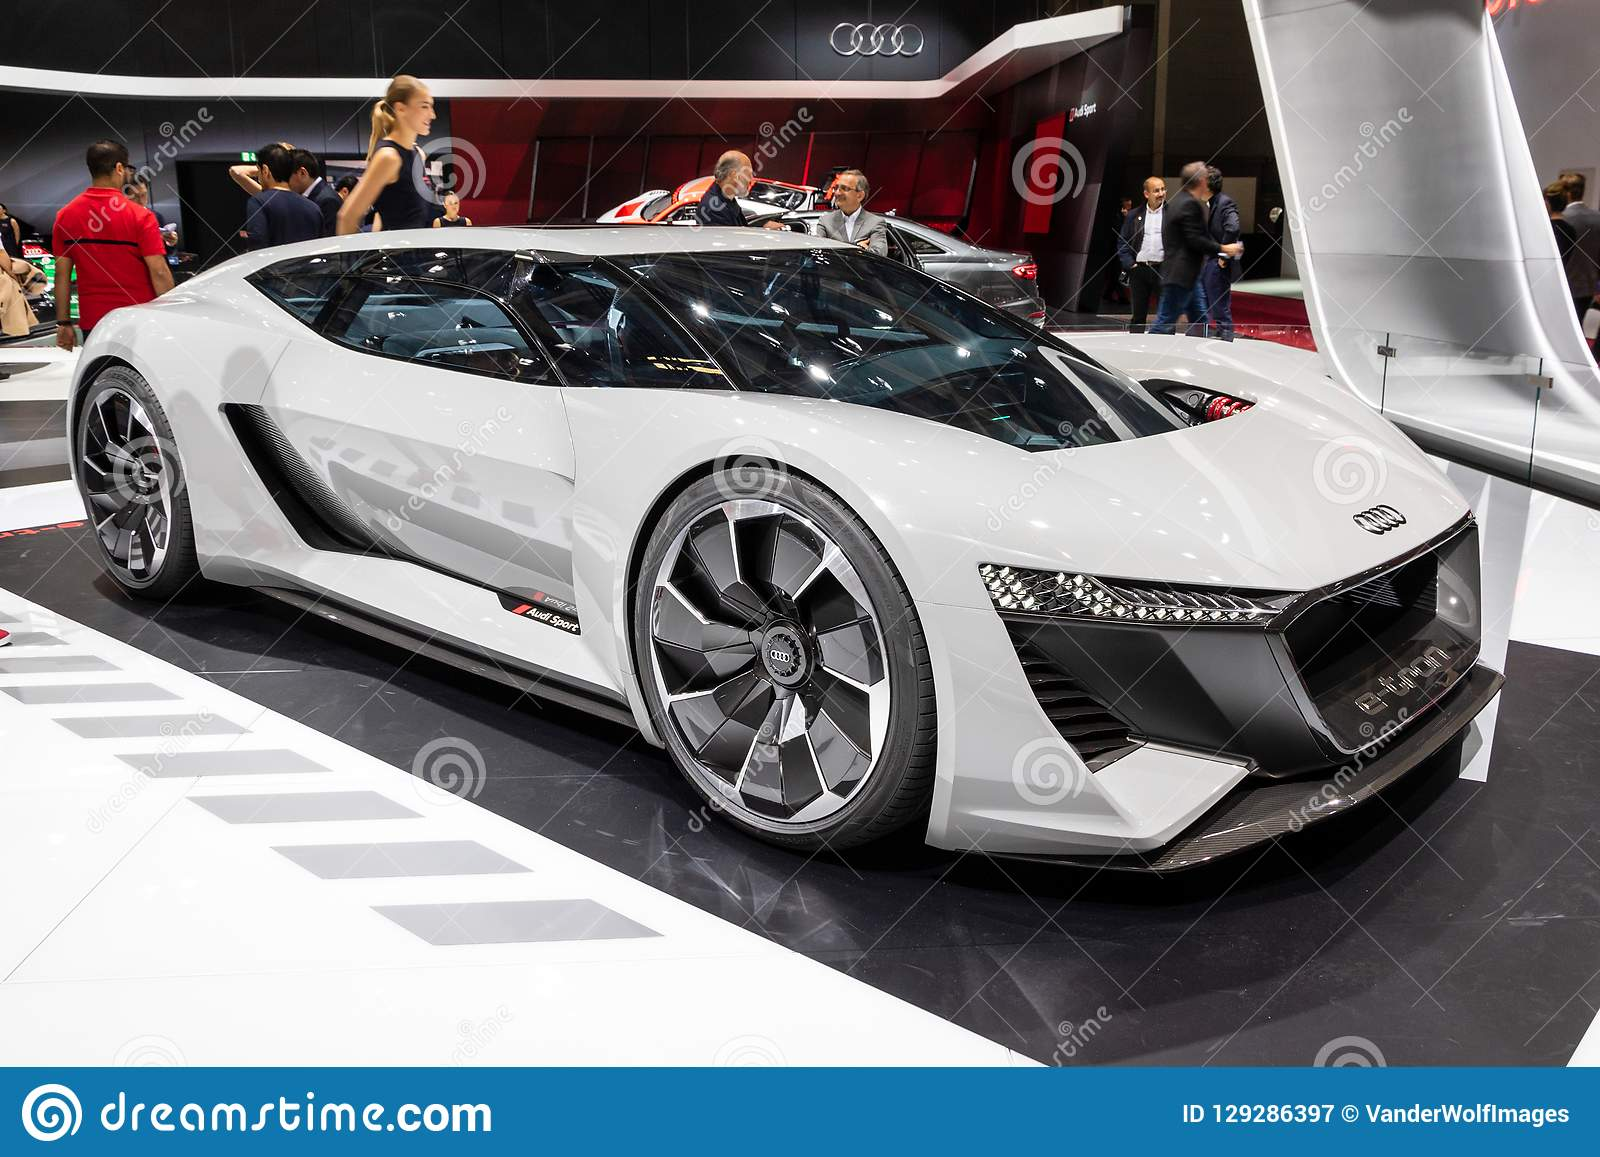 Audi Pb18 E Tron Concept Super Car Editorial Photography Image Of